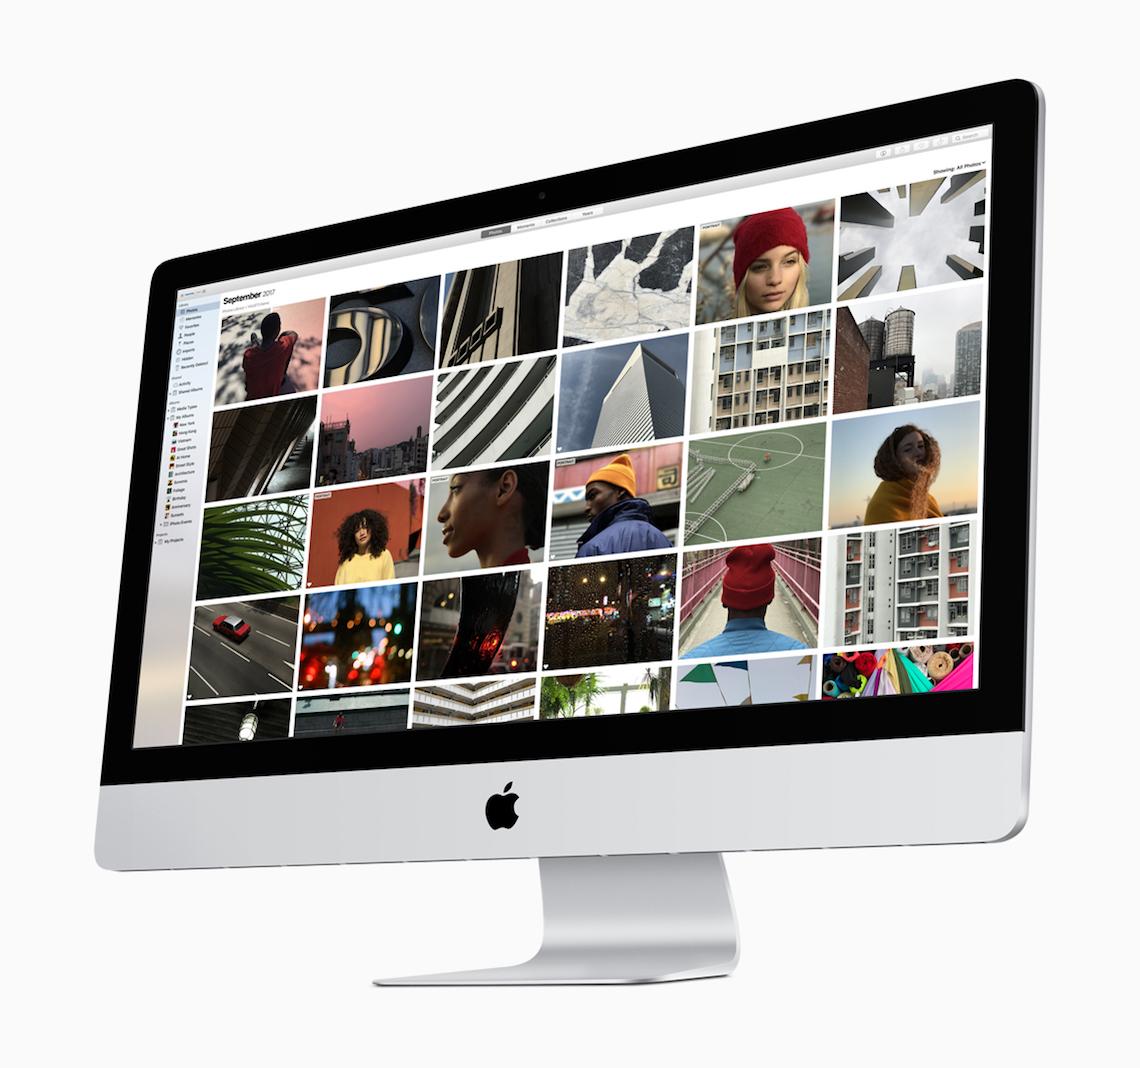 macOS HighSierra